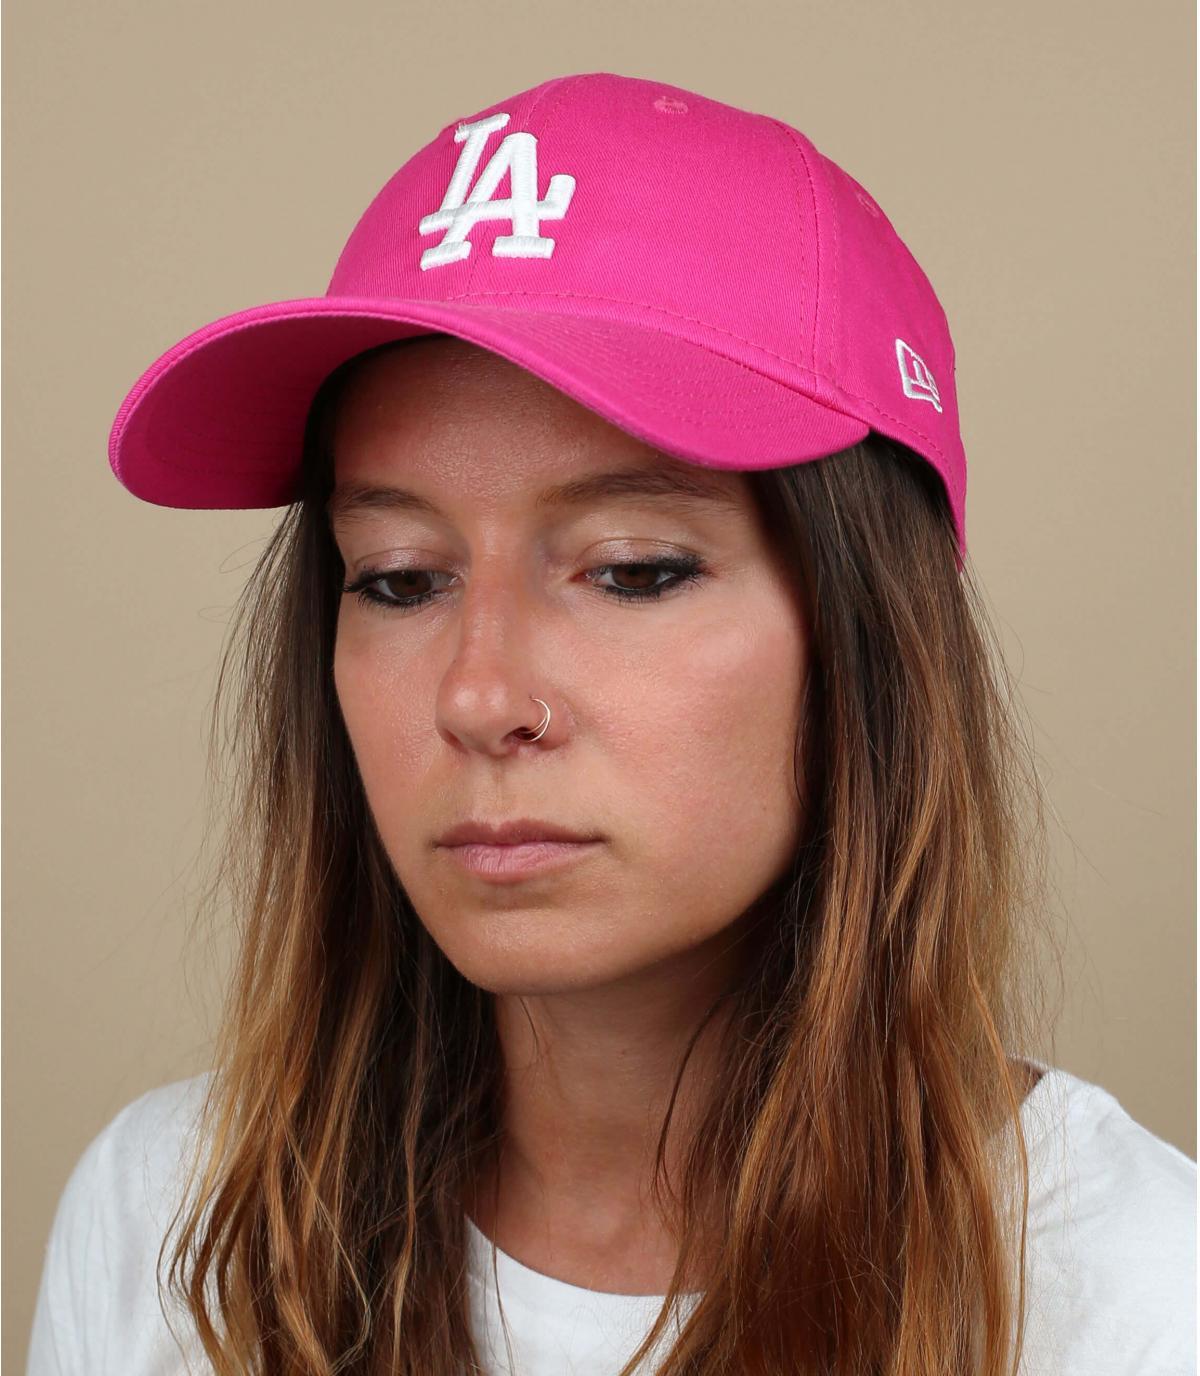 gorra LA mujer rosa